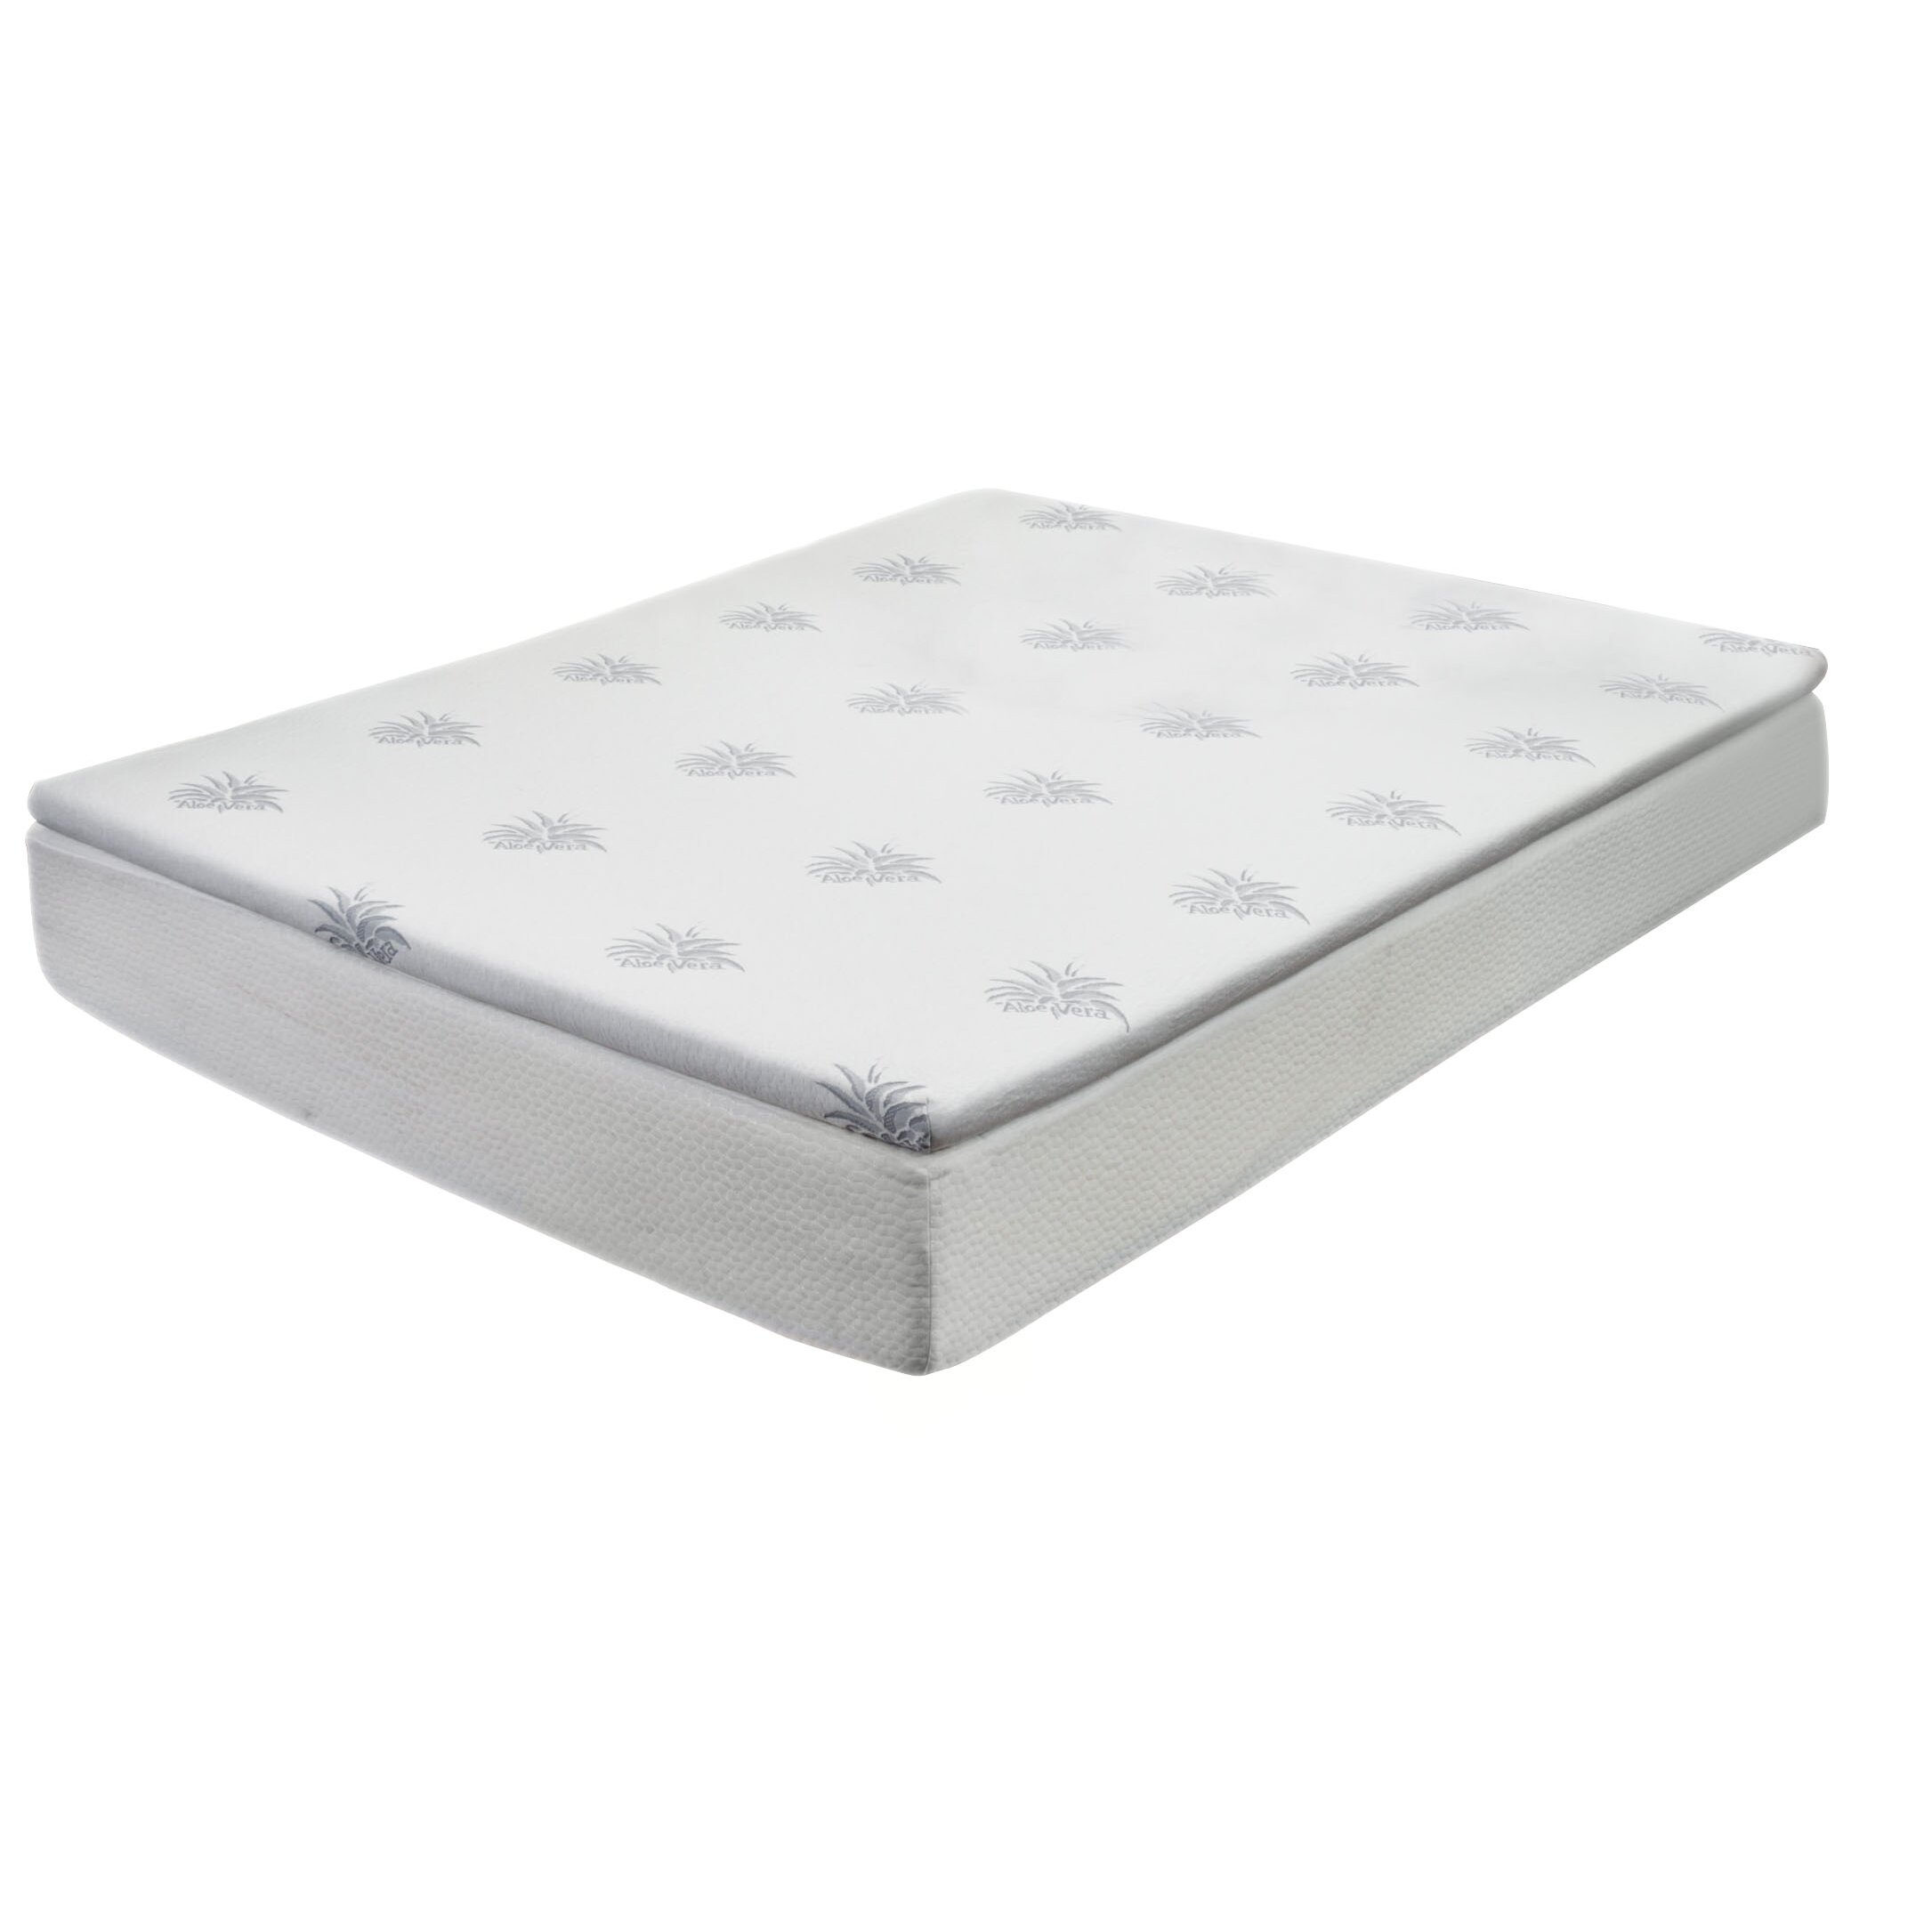 Home Loft Concepts Gel Memory Foam Mattress Topper